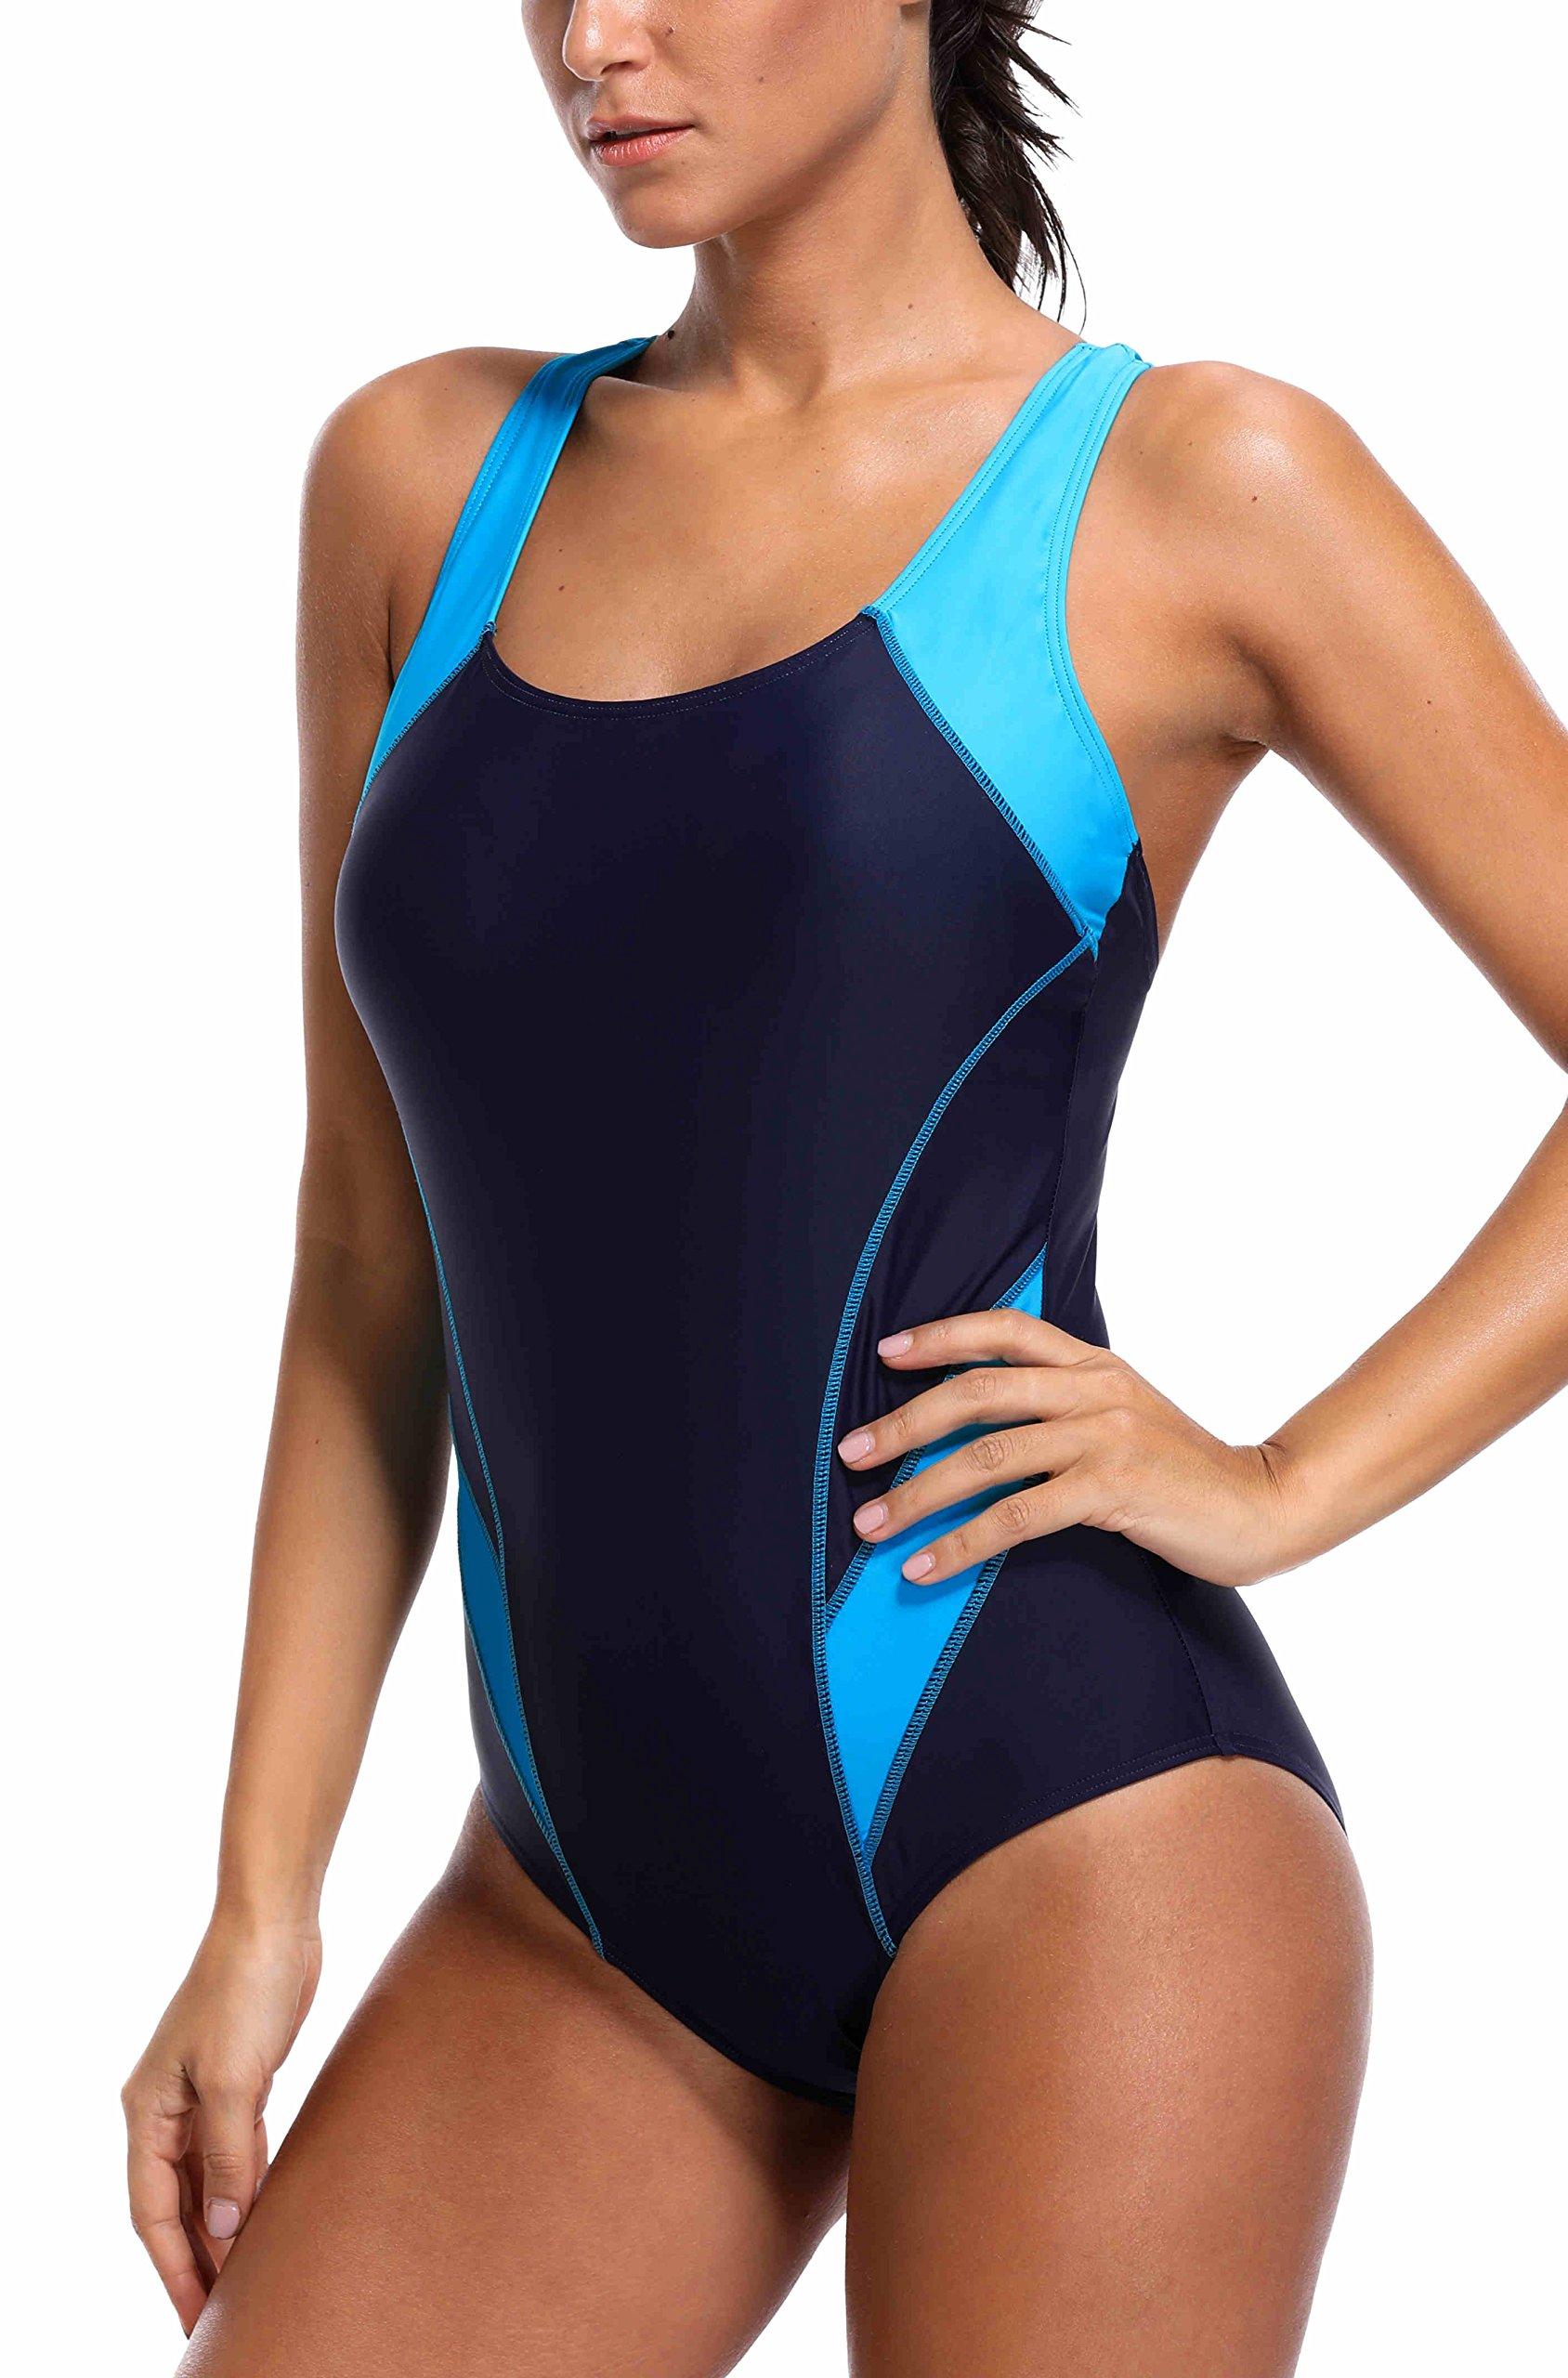 belamo Women Racerback Resistant one Piece Swimwear Ladies Sport Athletic Swimming Suit